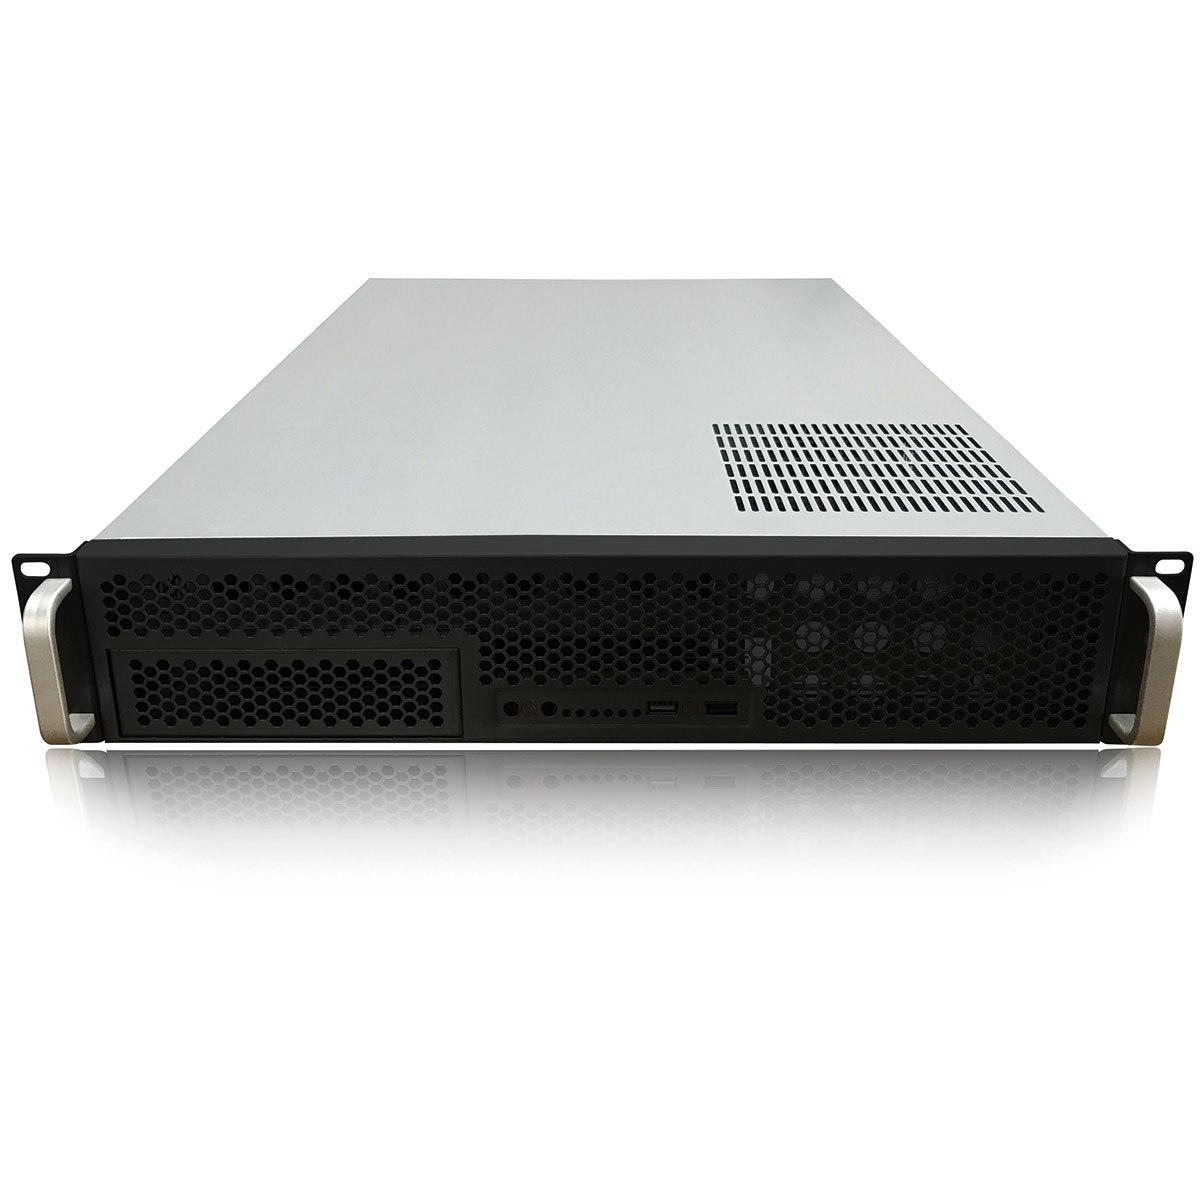 "TGC Rack Mountable Server Chassis 2U With 6 Fixed HDD Bays, 3 Optional 2.5"" HDD Bays - No Psu"